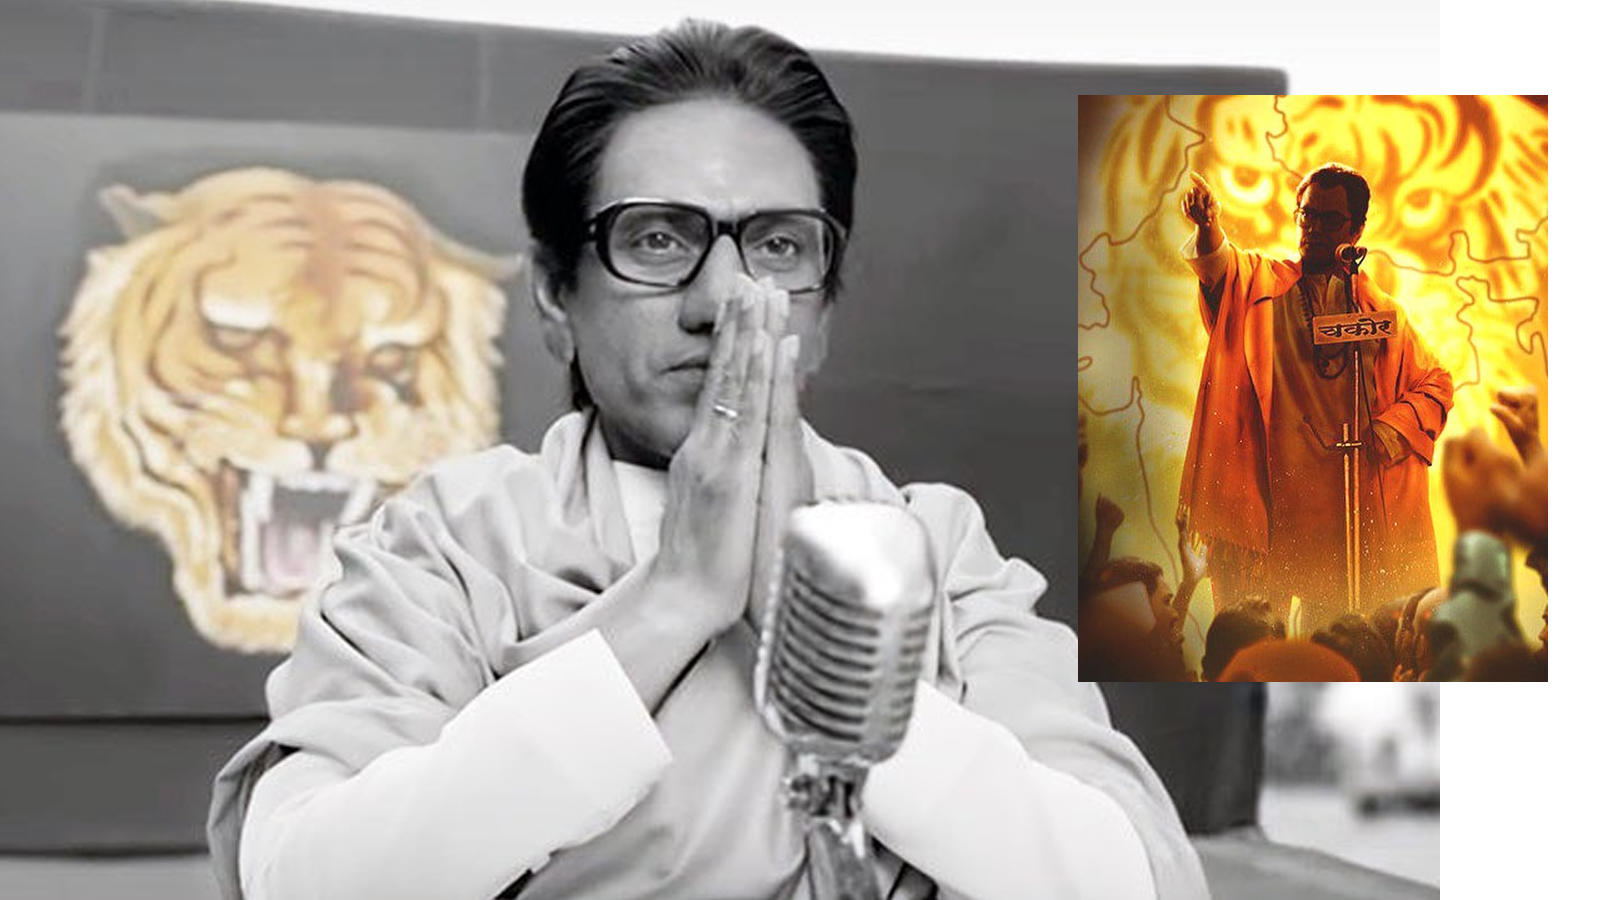 'Thackeray' not a propaganda movie: Nawazuddin Siddiqui on film's release during election season